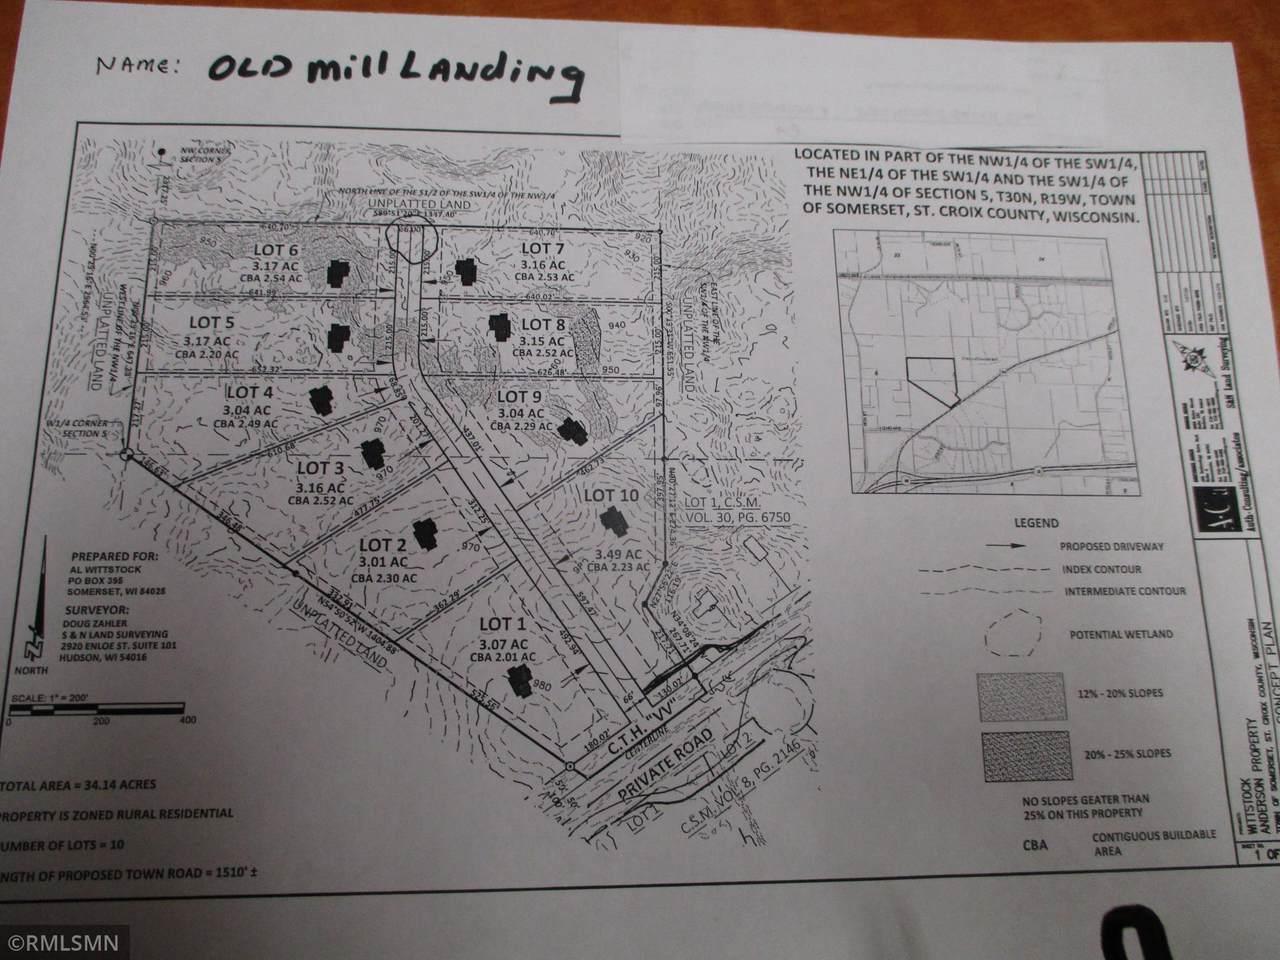 xxx lot 1 County V V Old Mill Landing - Photo 1